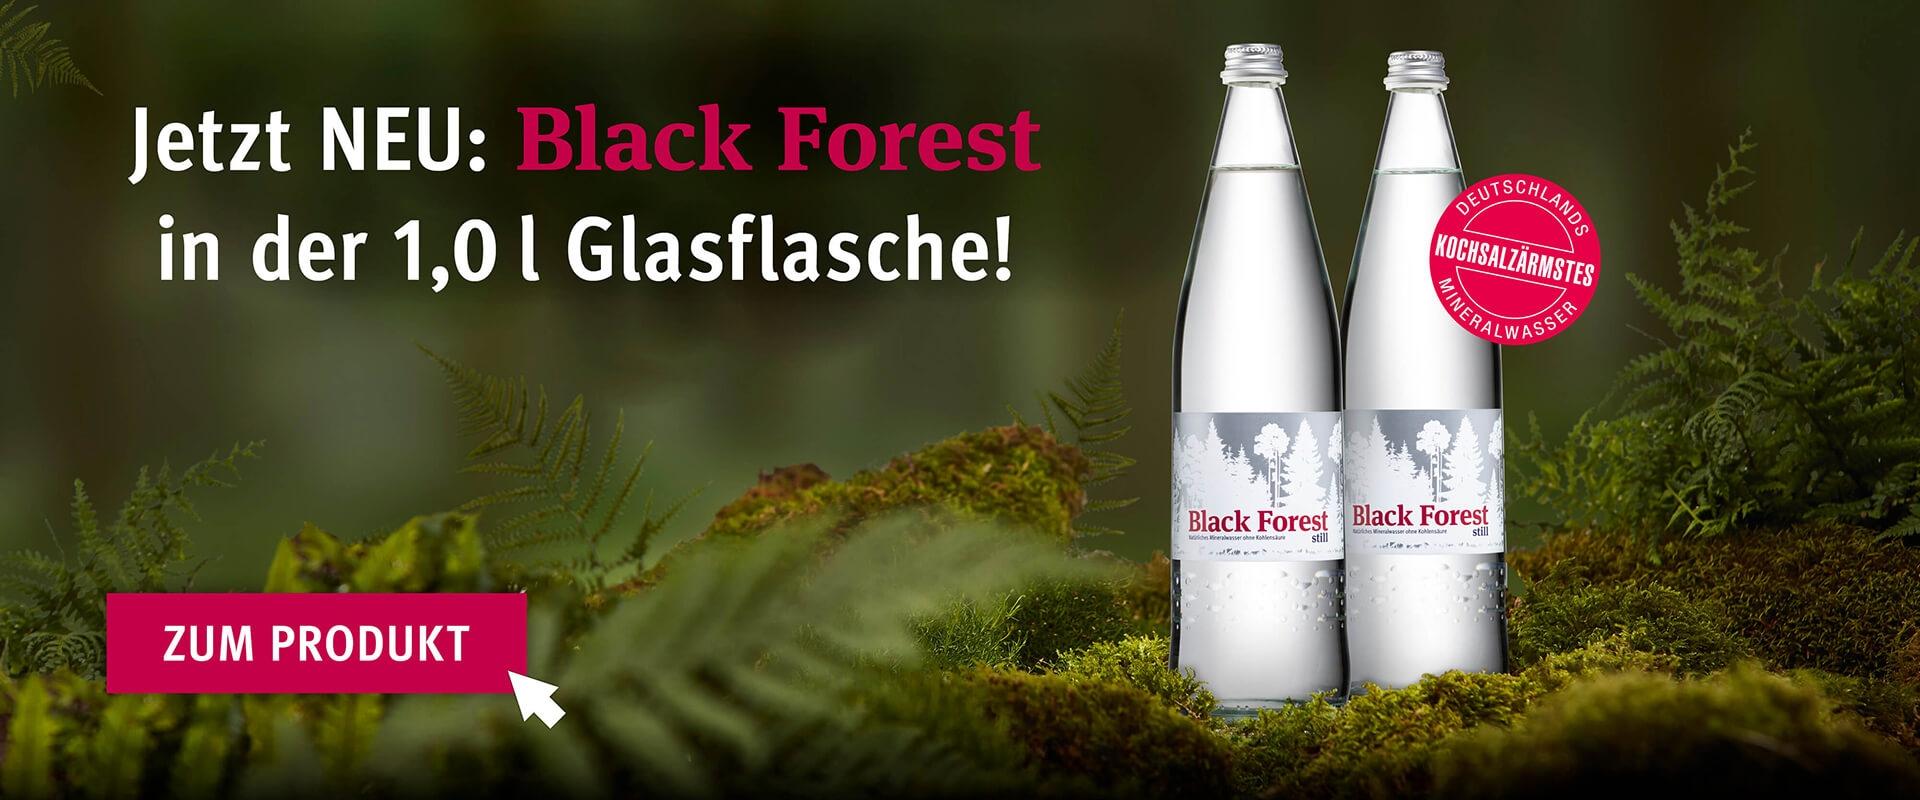 Black Forest still 1,0L Glas